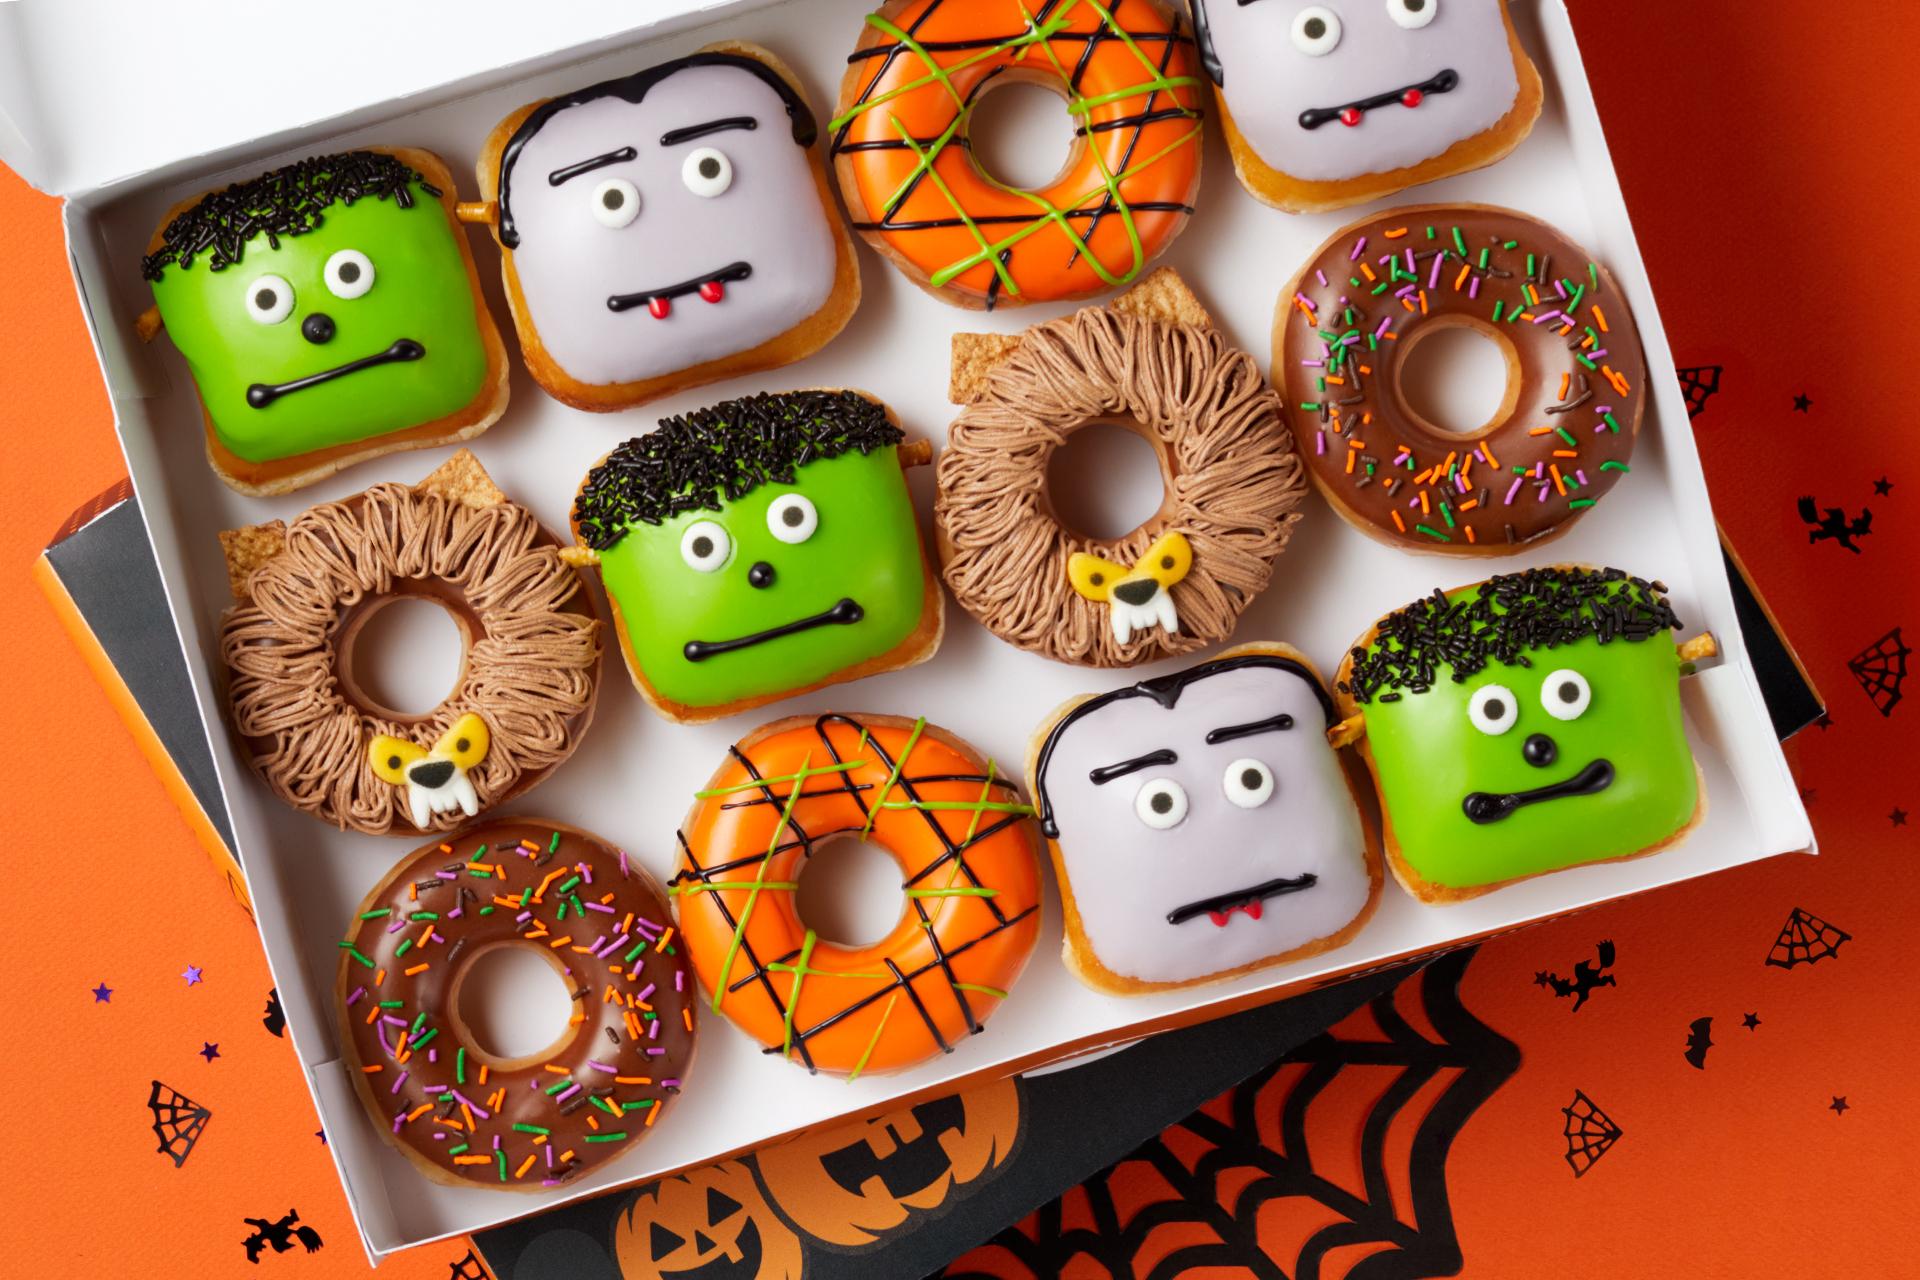 Halloween Food Deals 2020 Idaho Falls Krispy Kreme drops new Halloween doughnuts, $1 dozen deal | KRON4